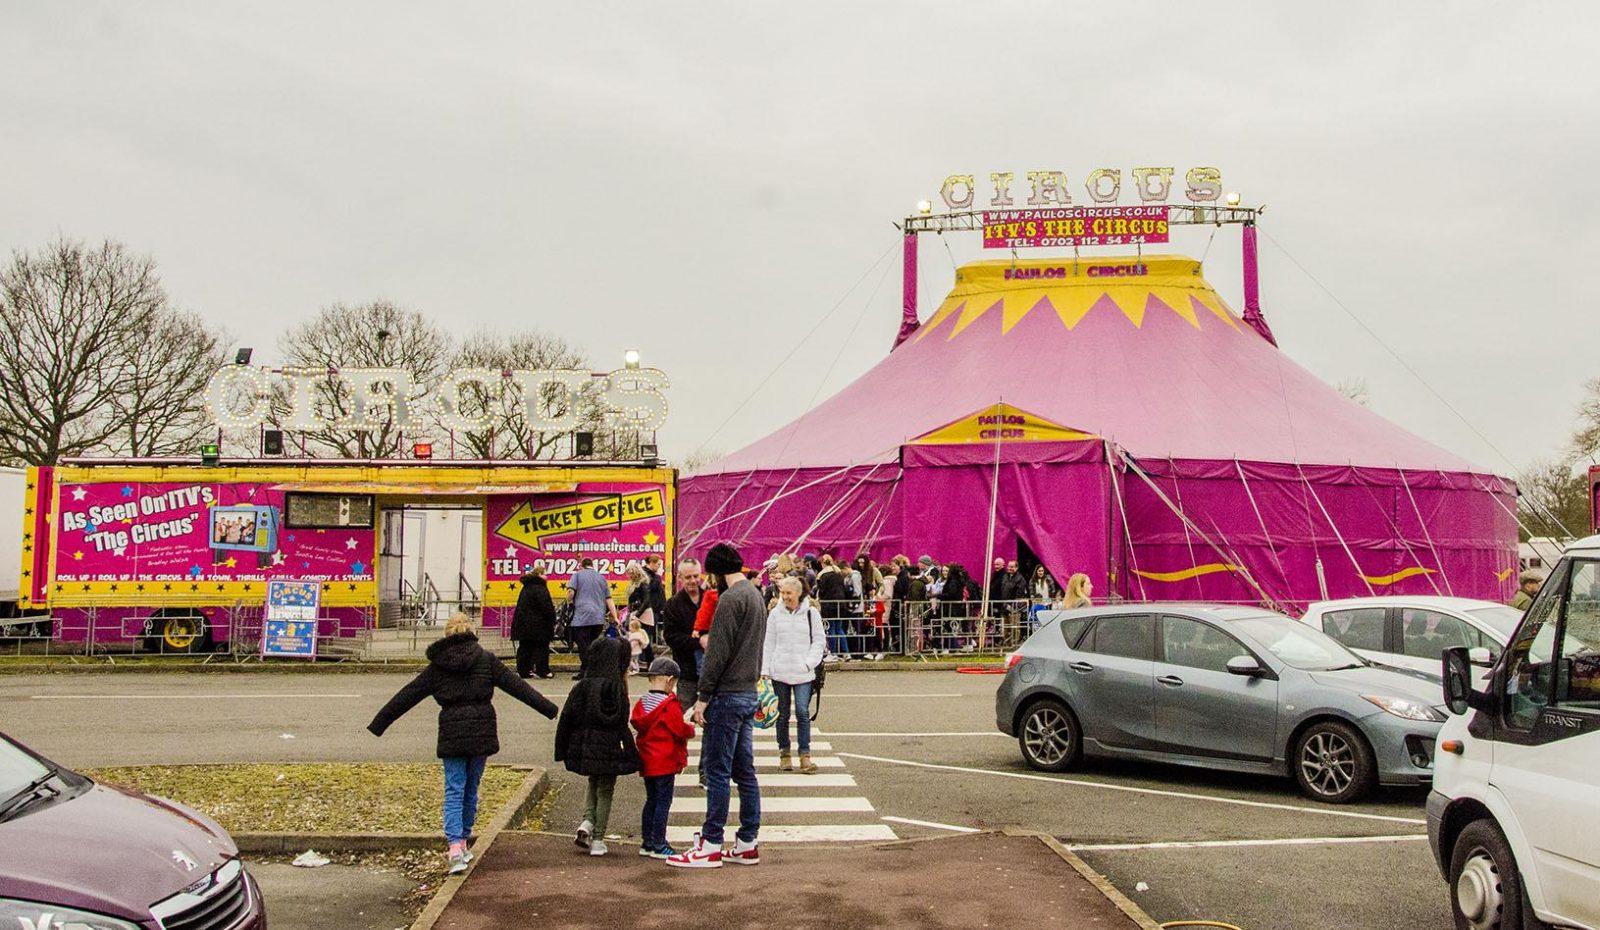 The Paulos Circus Big Top